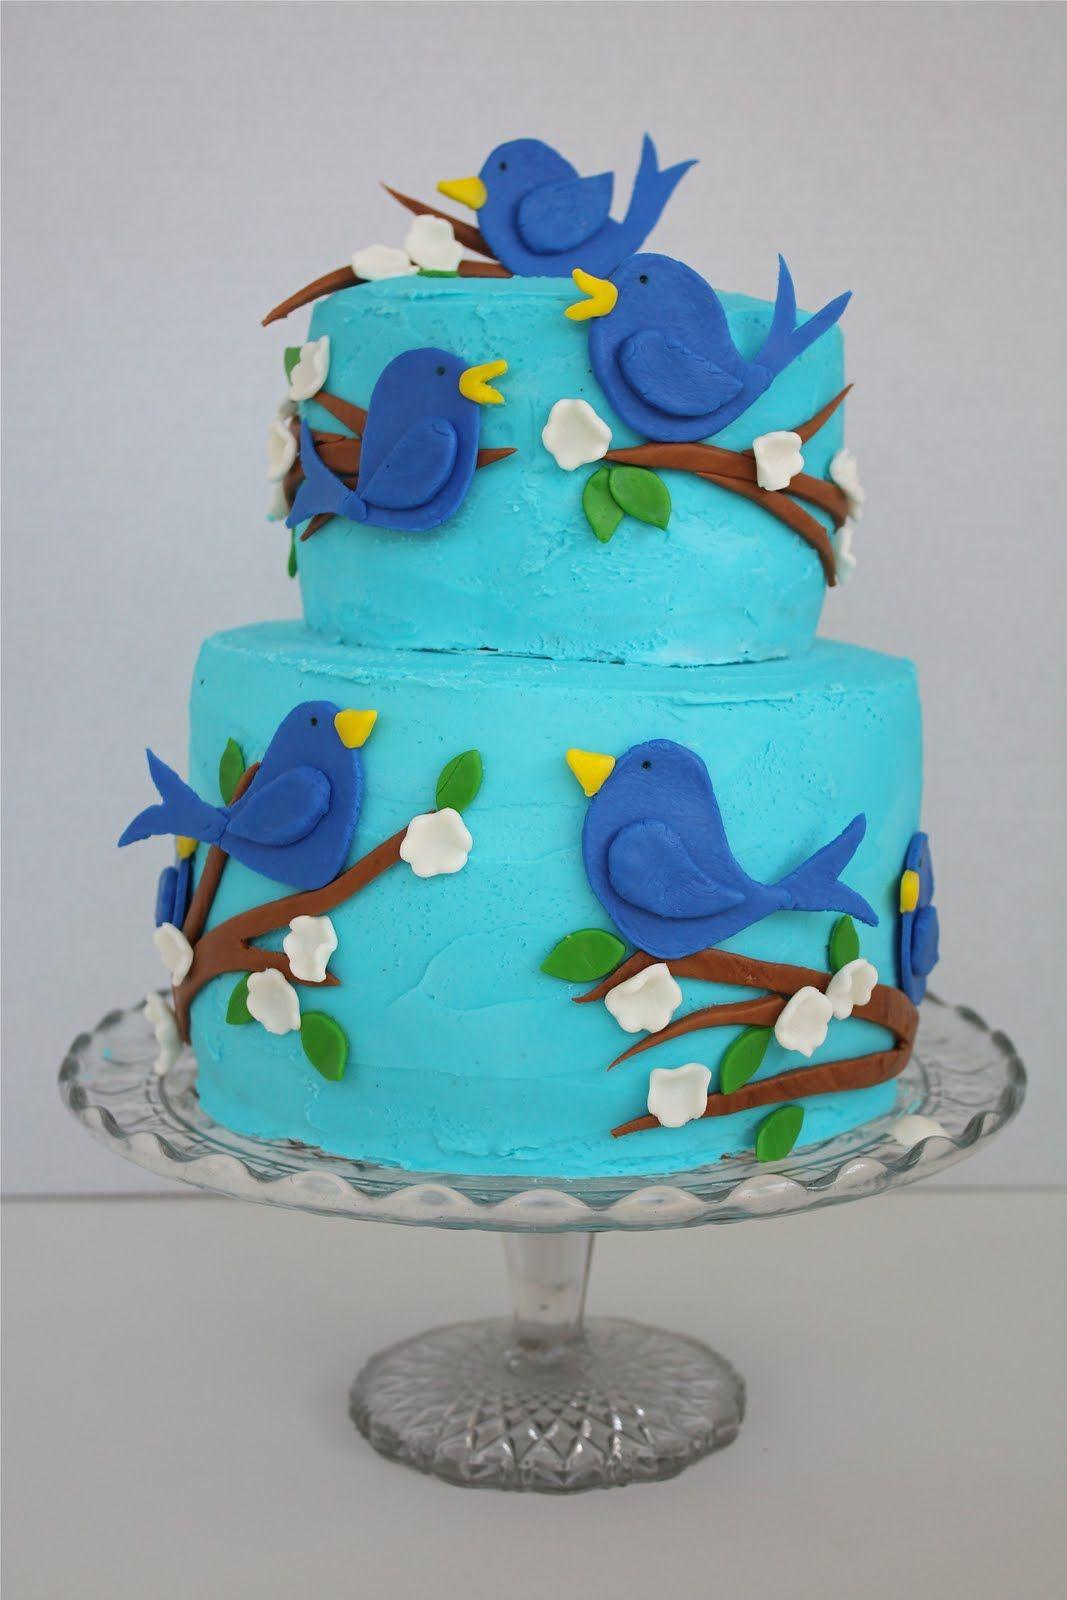 Pleasing 23 Inspiration Image Of Bird Birthday Cake Bird Birthday Cake Funny Birthday Cards Online Alyptdamsfinfo